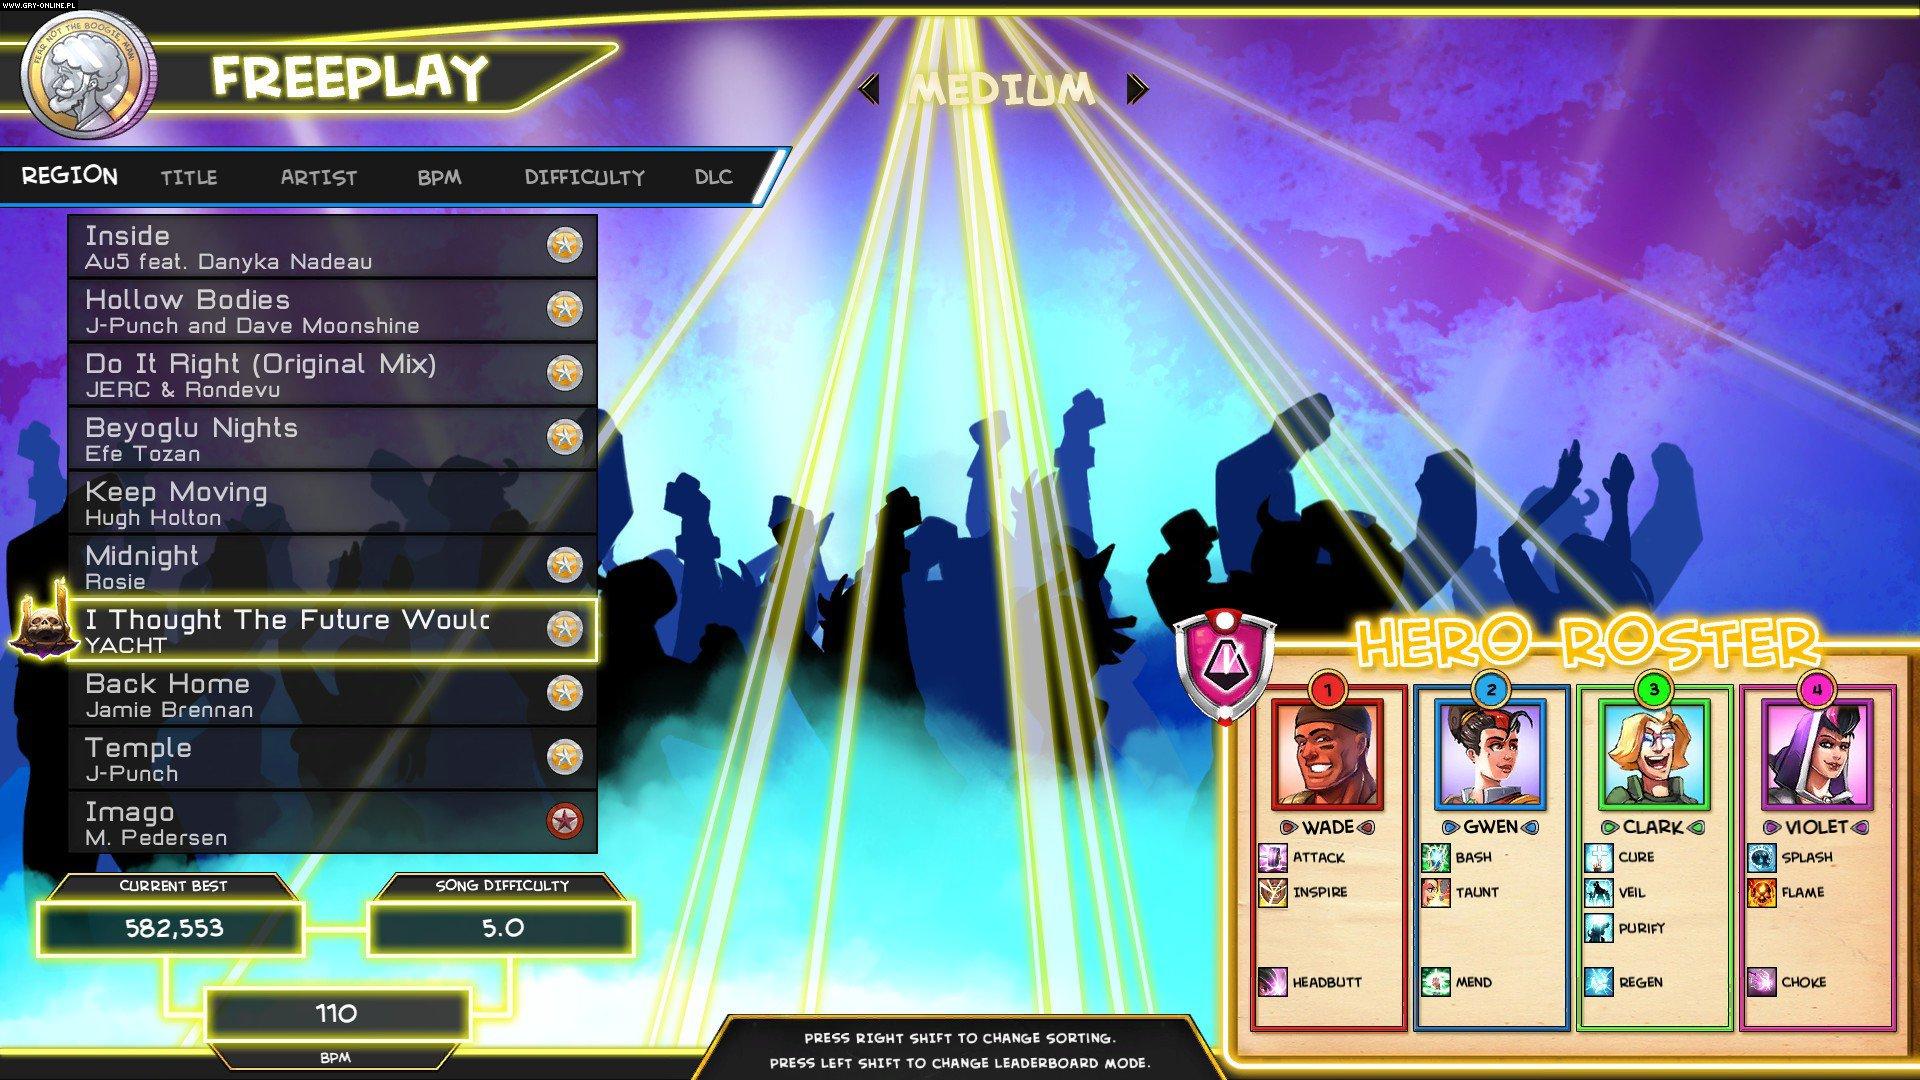 The Metronomicon: Slay the Dance Floor download